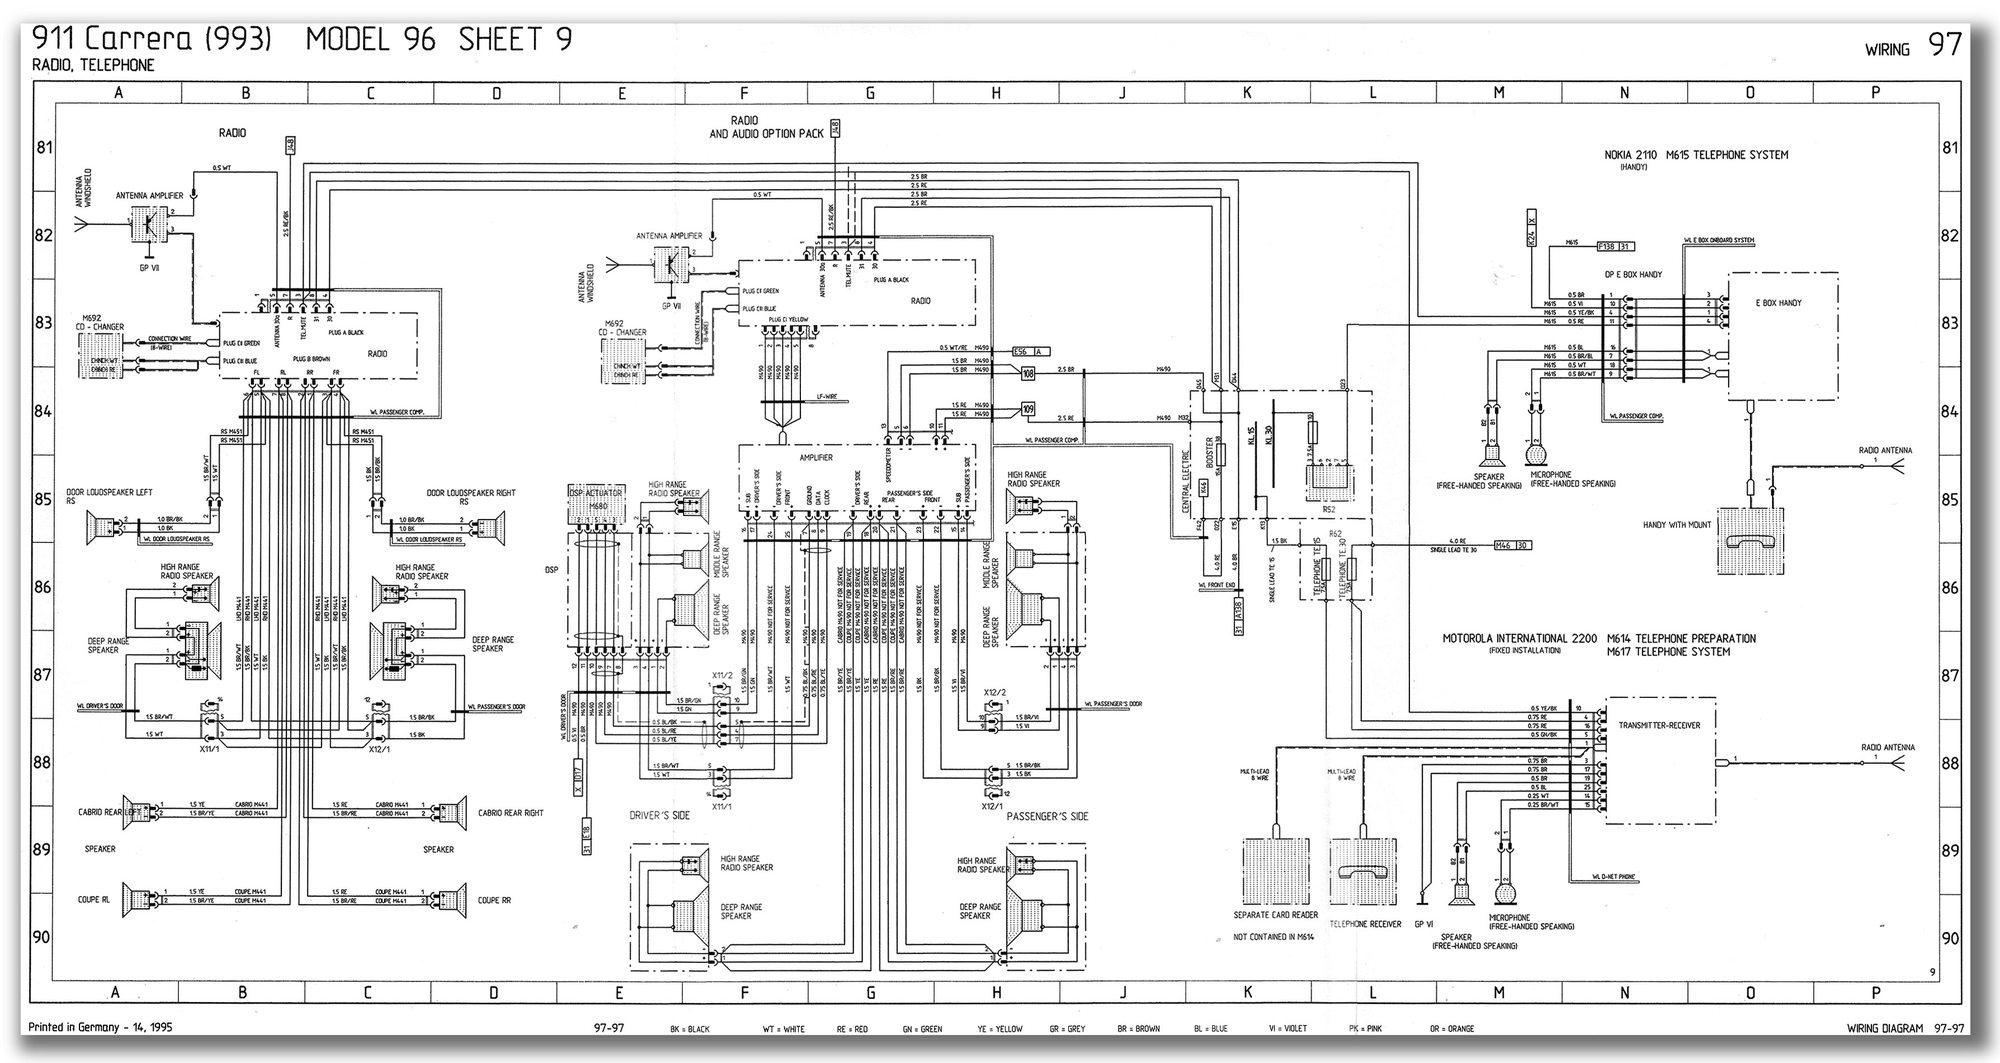 M490 Speaker Box Wiring Question